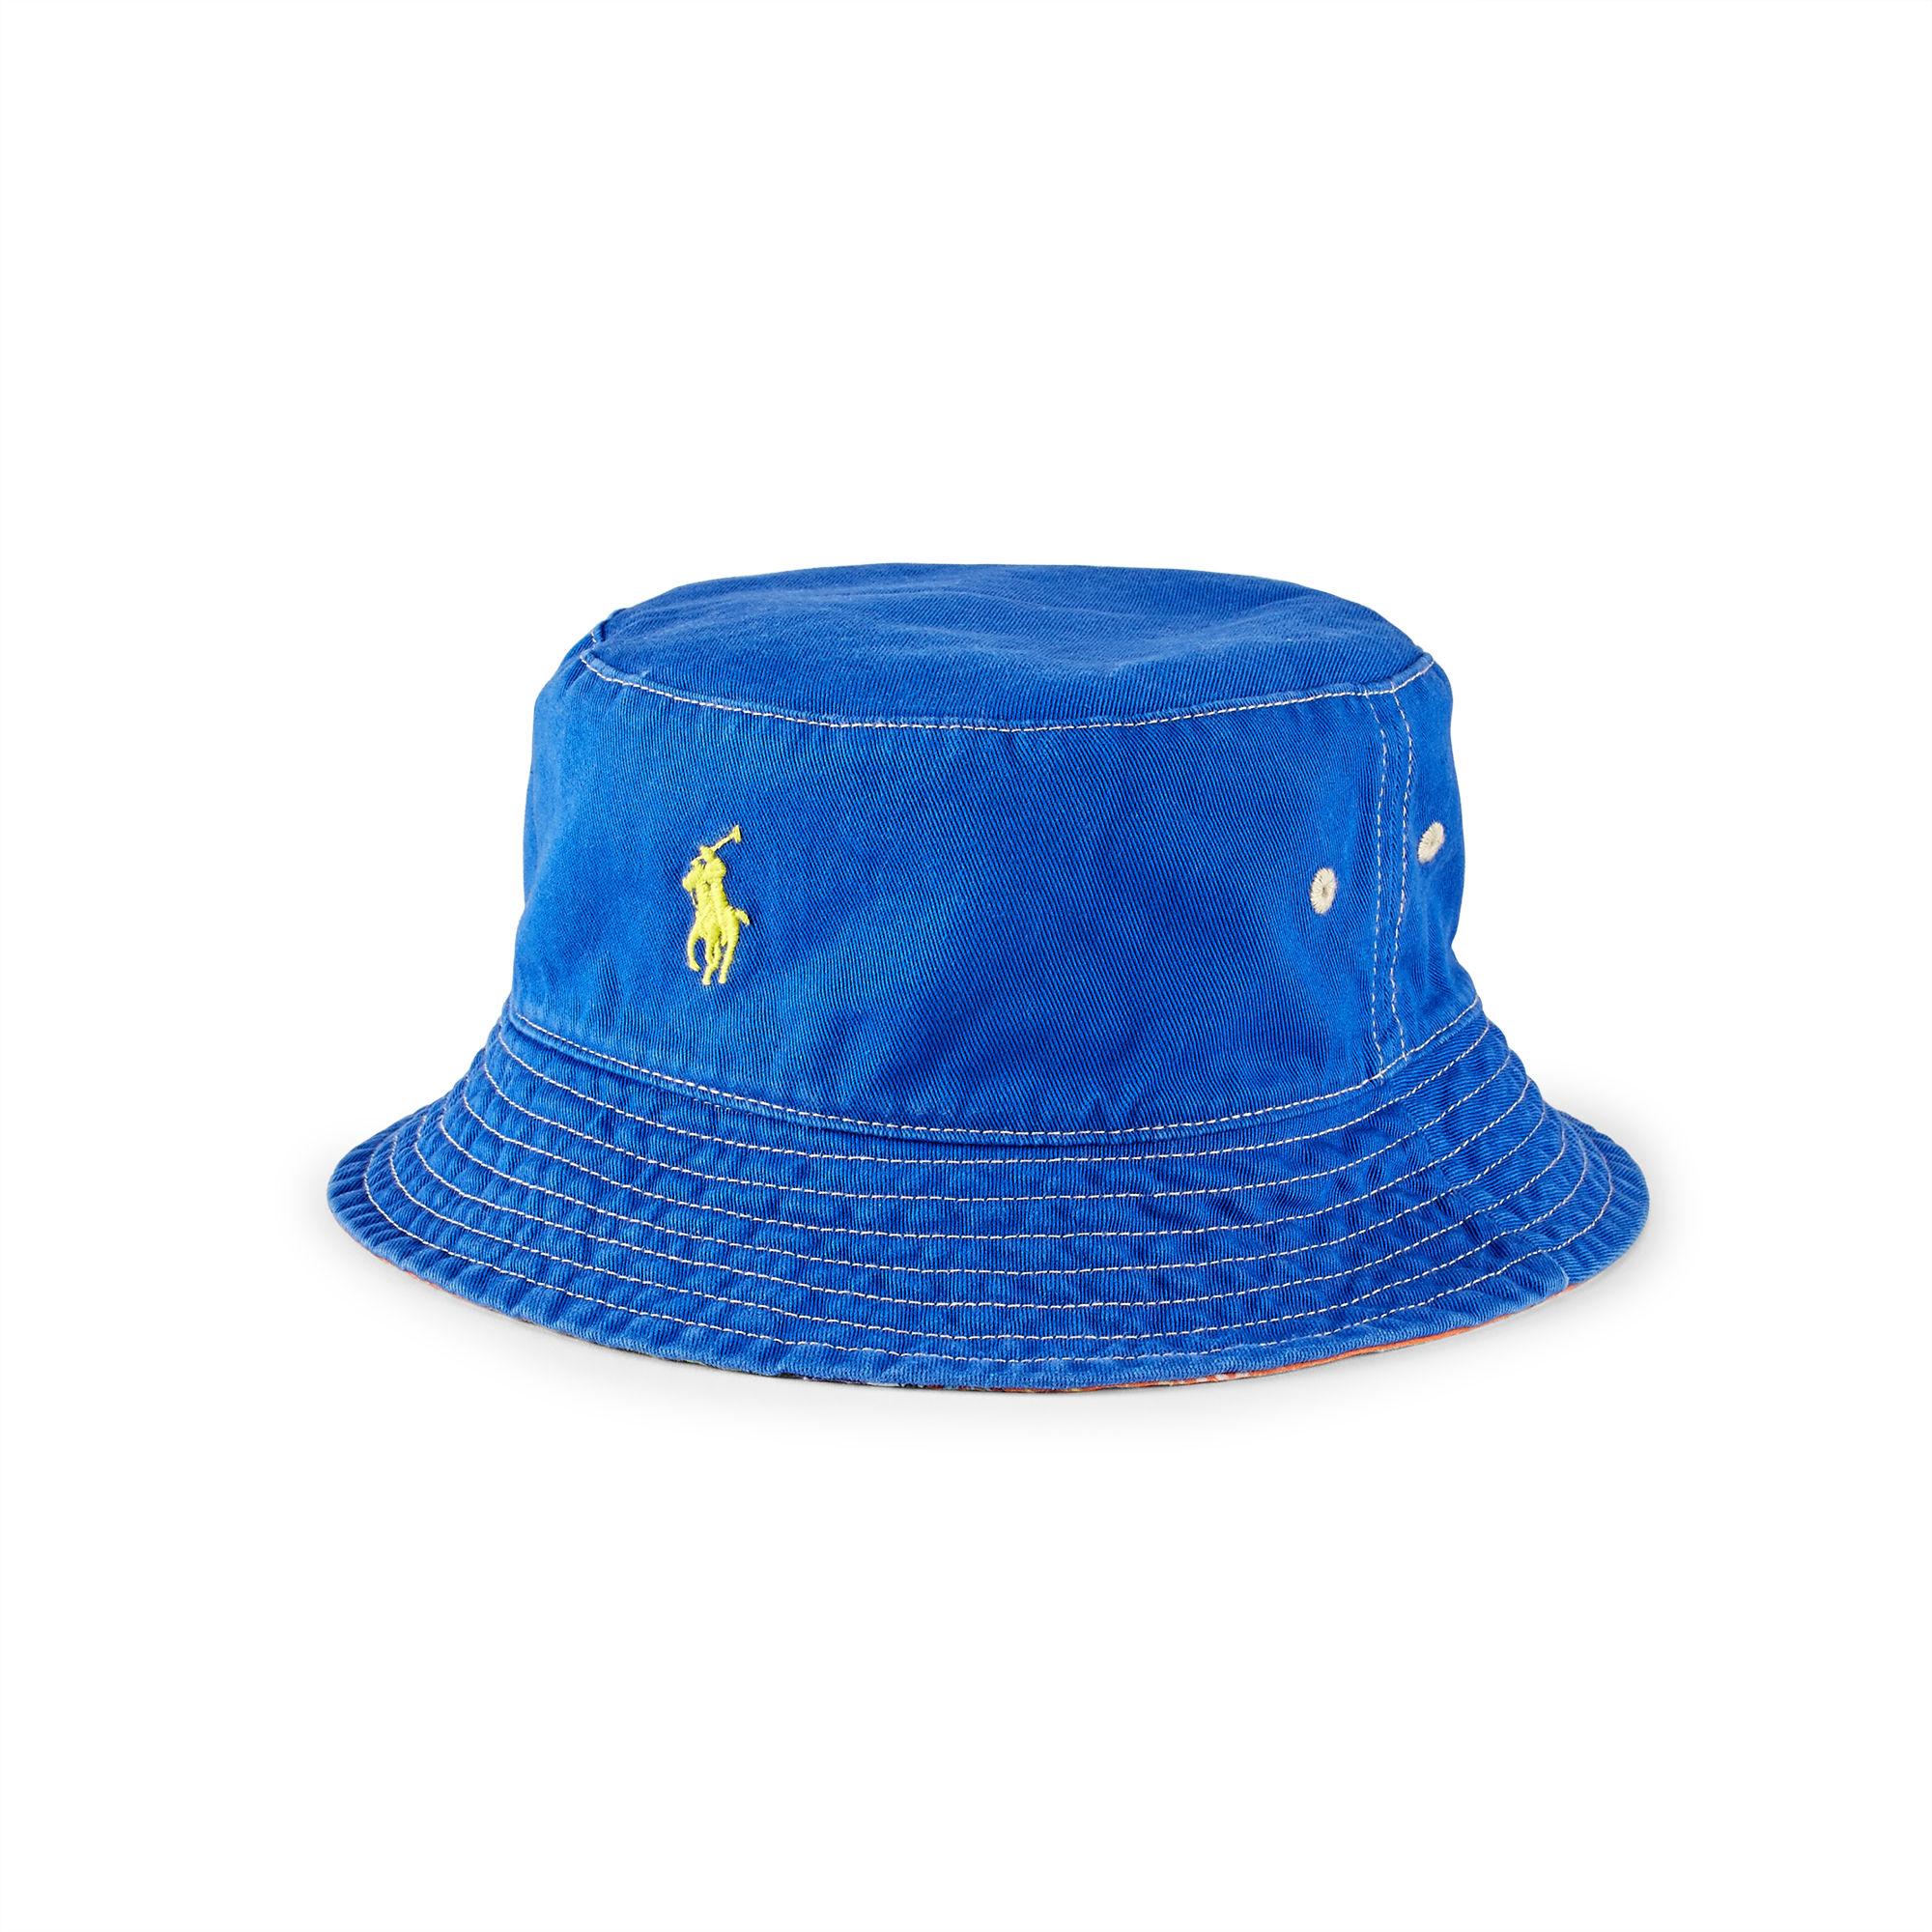 Polo Ralph Lauren Cotton Reversible Twill Bucket Hat For